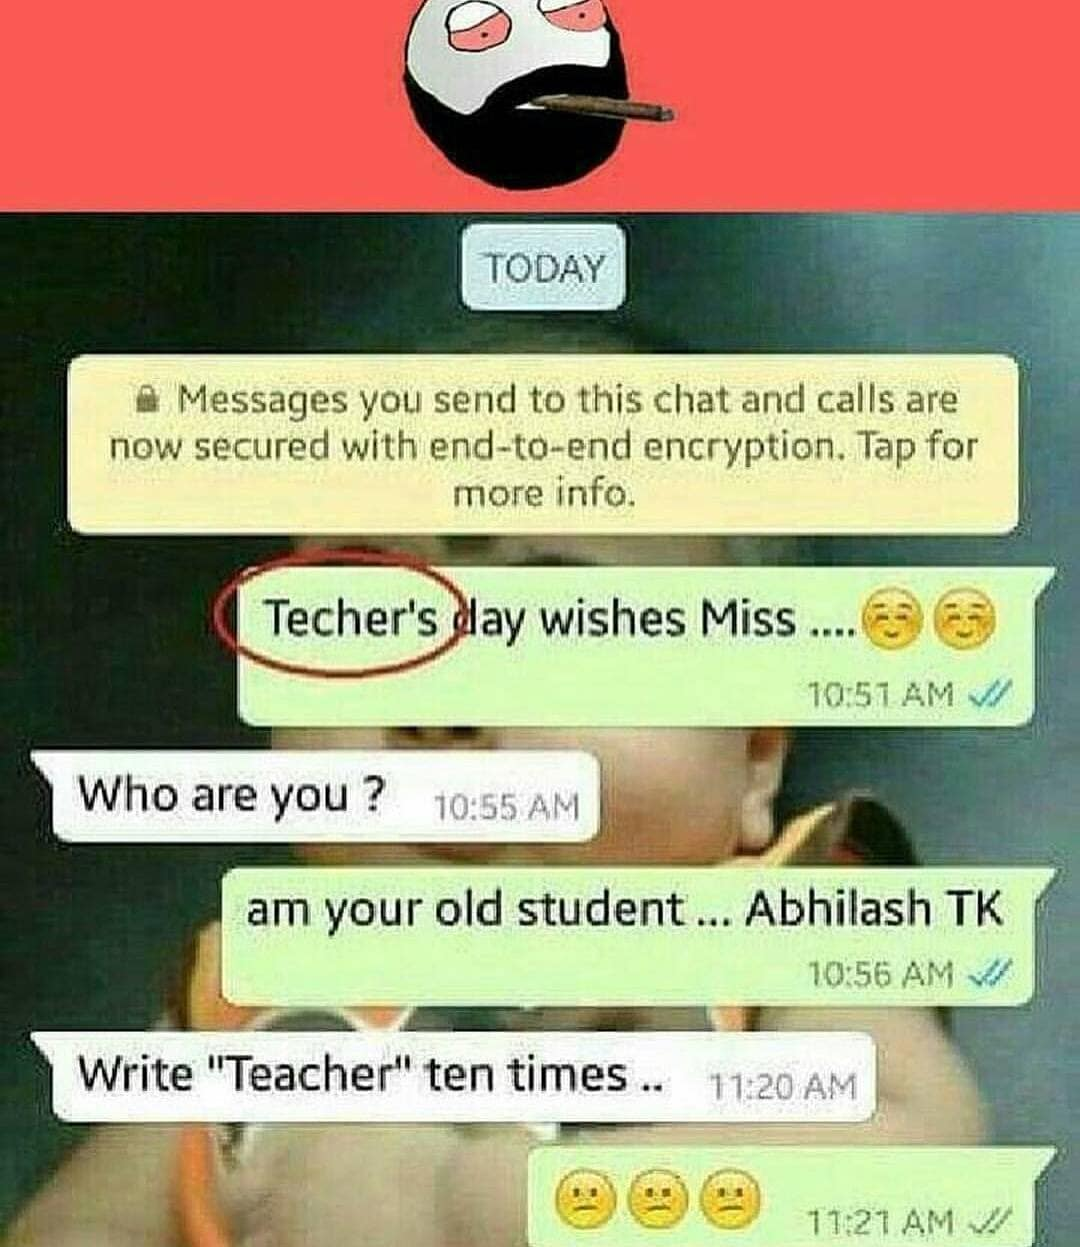 Funny Chats on WhatsApp Hindi / Urdu |Funny Whatsapp Chats